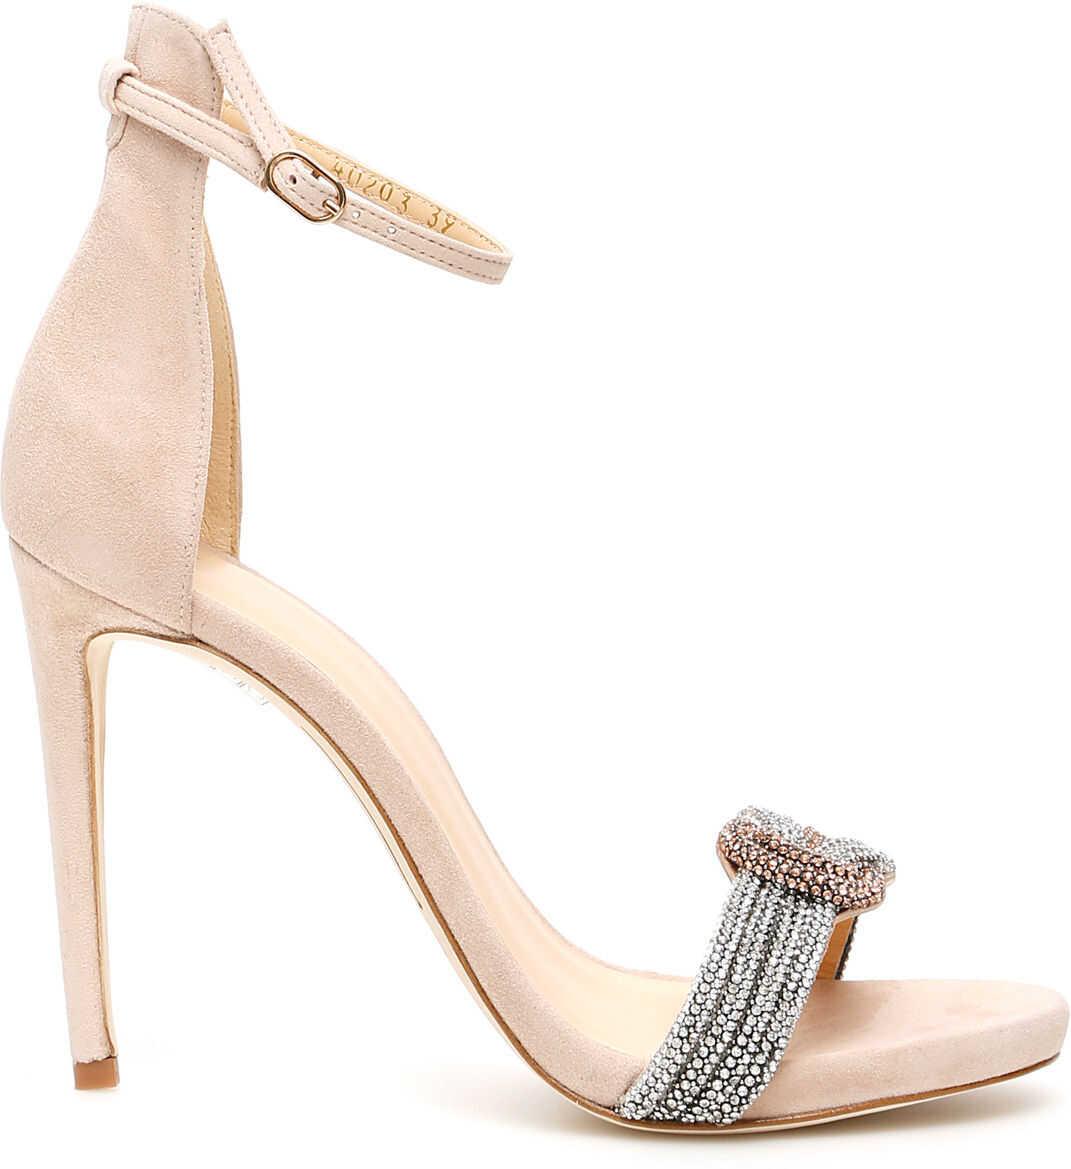 Alexandre Birman Bicolor Crystal Sizzle Sandals SAND